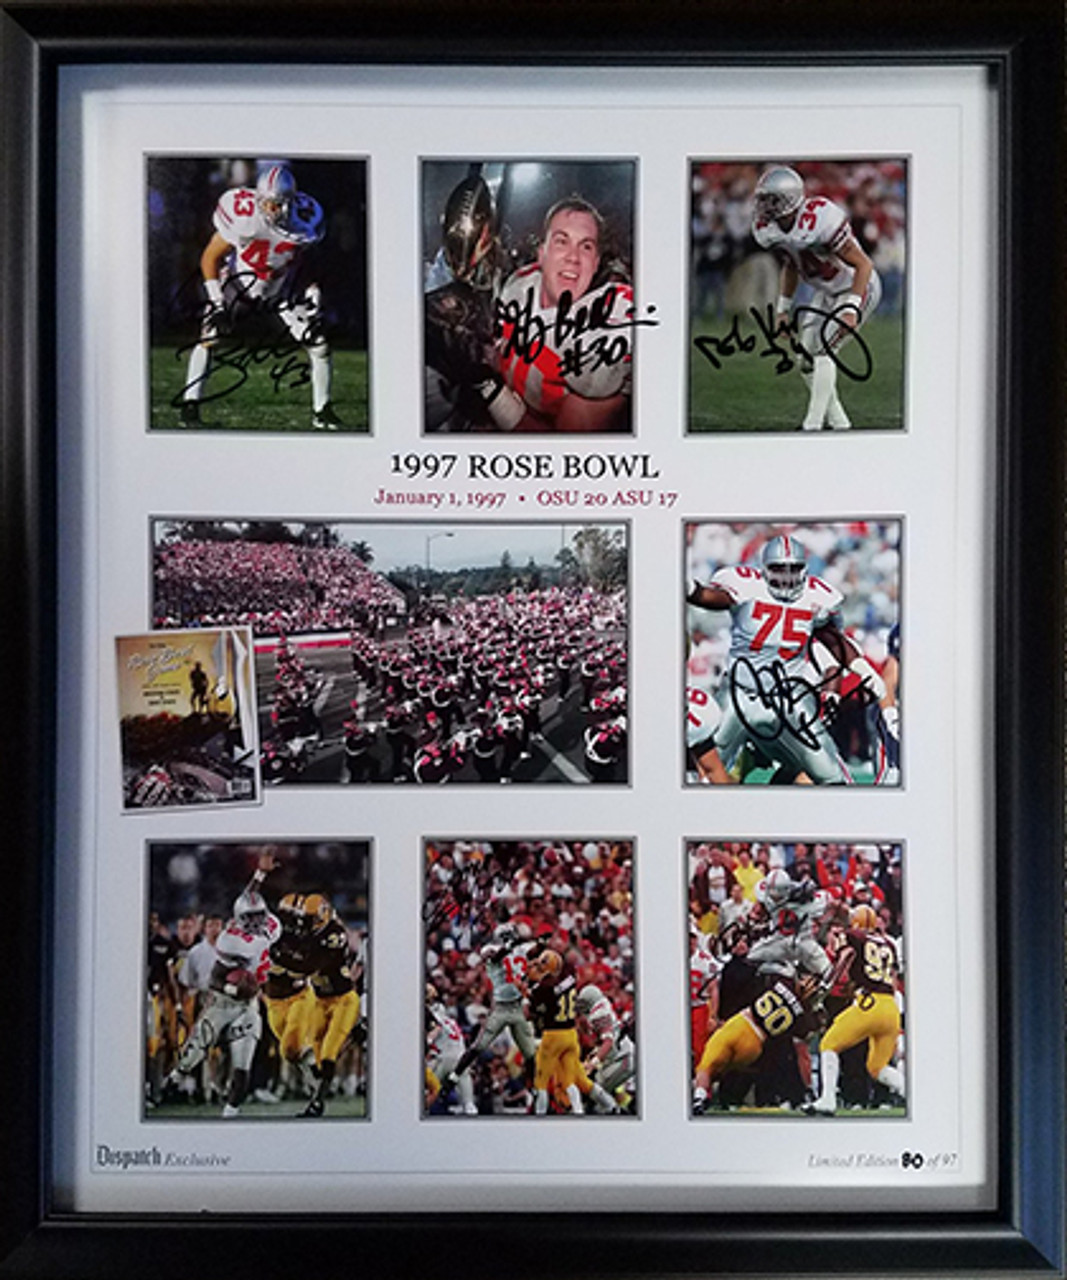 1997 Rose Bowl Ltd. Ed. 1 & 2